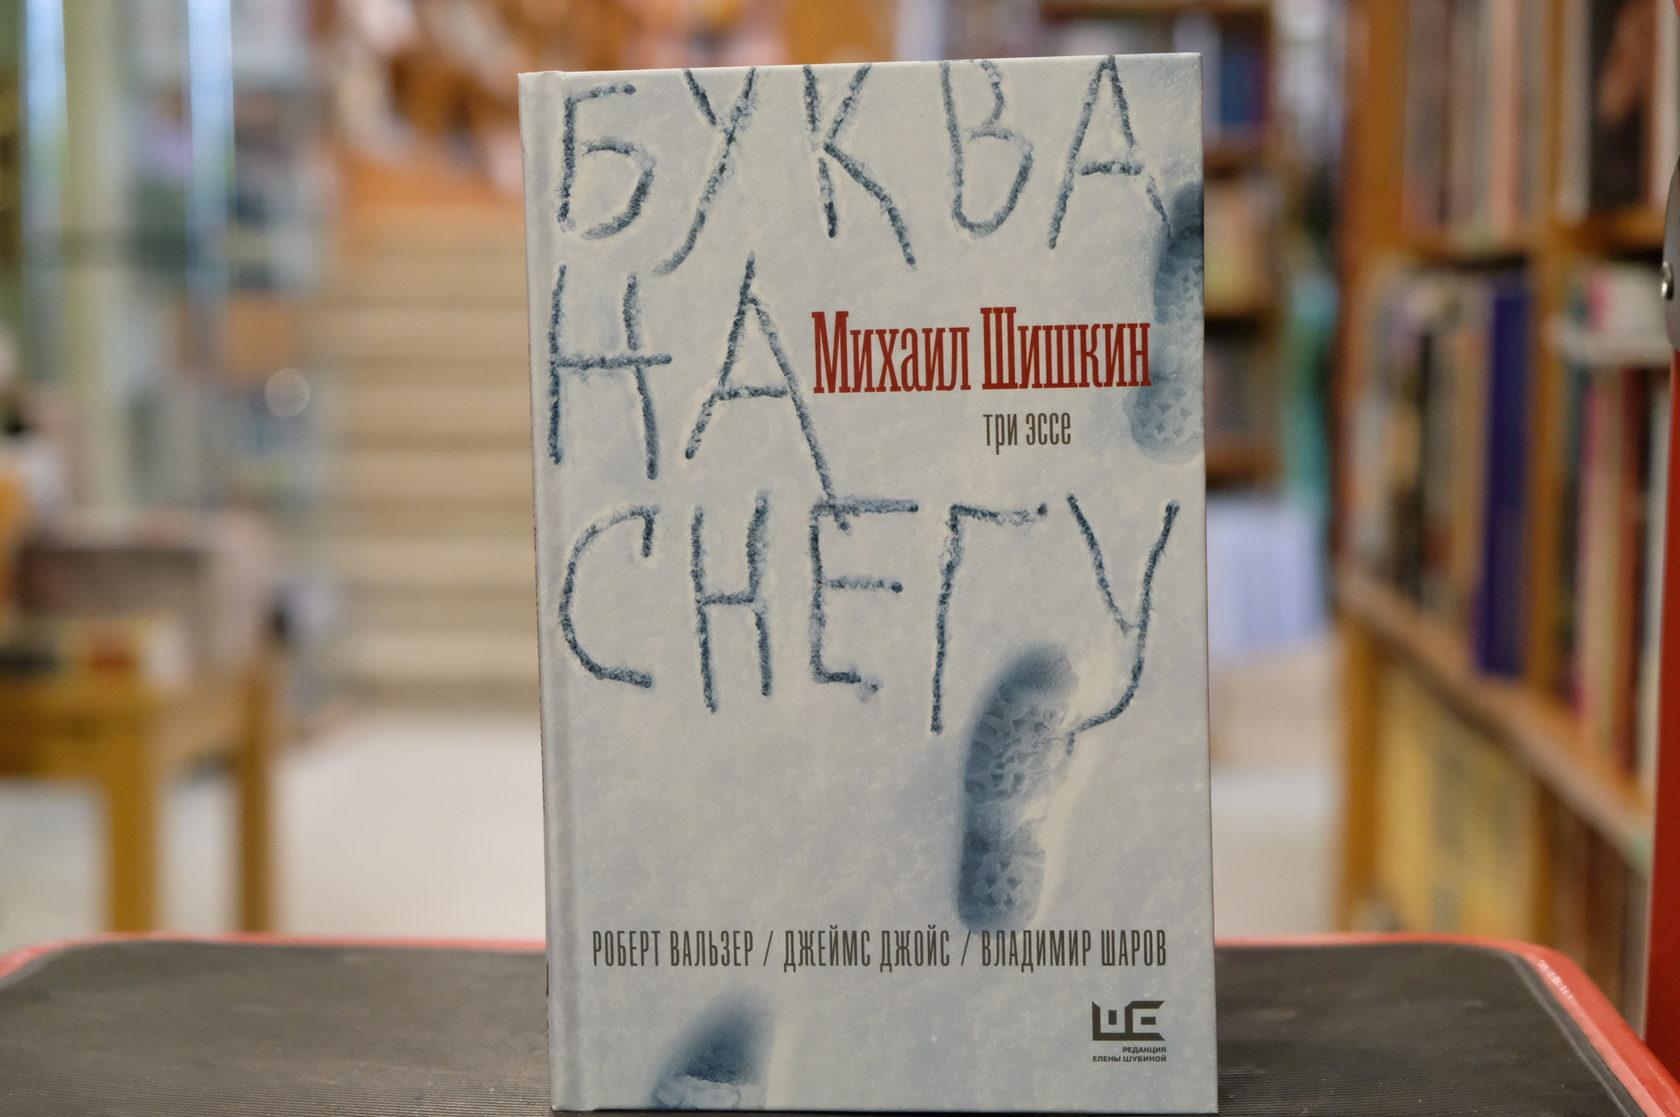 Купить Михаил Шишкин «Буква на снегу»